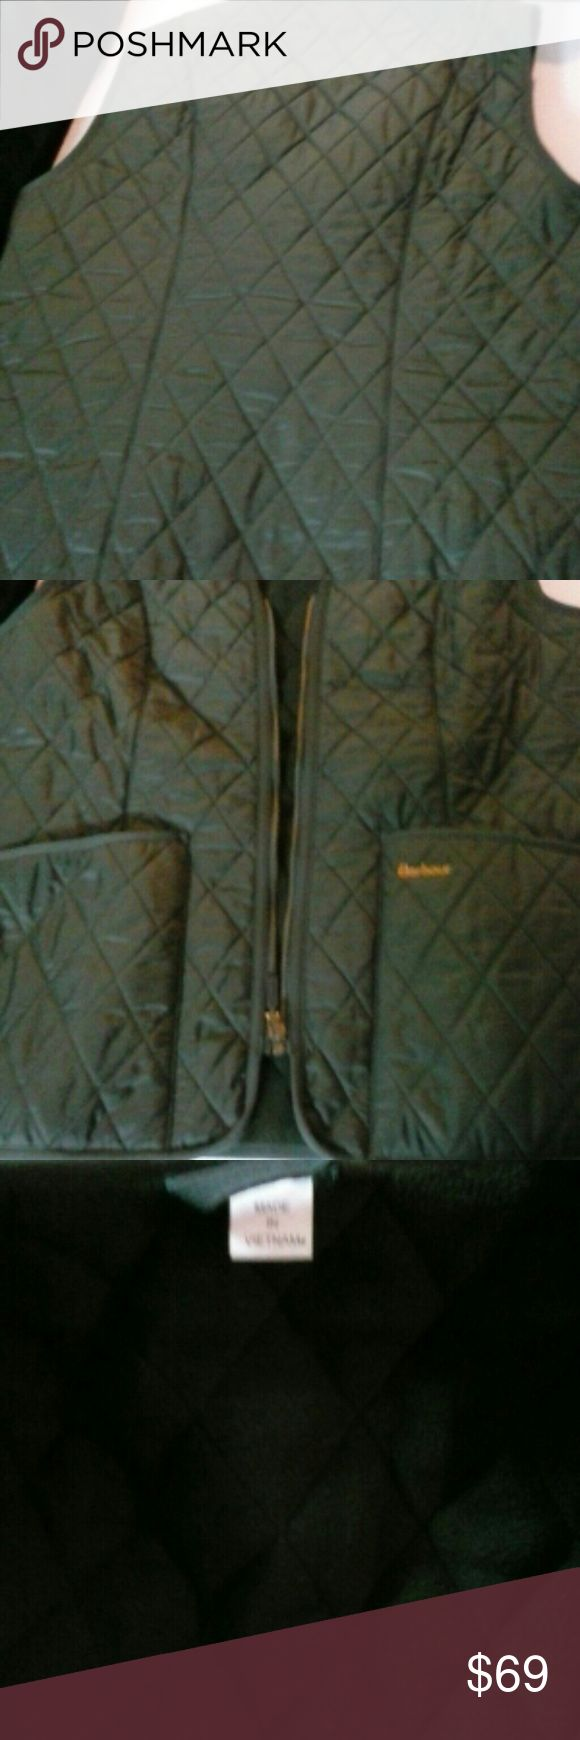 Barbour Vest add pics See original listing Barbour Jackets & Coats Vests